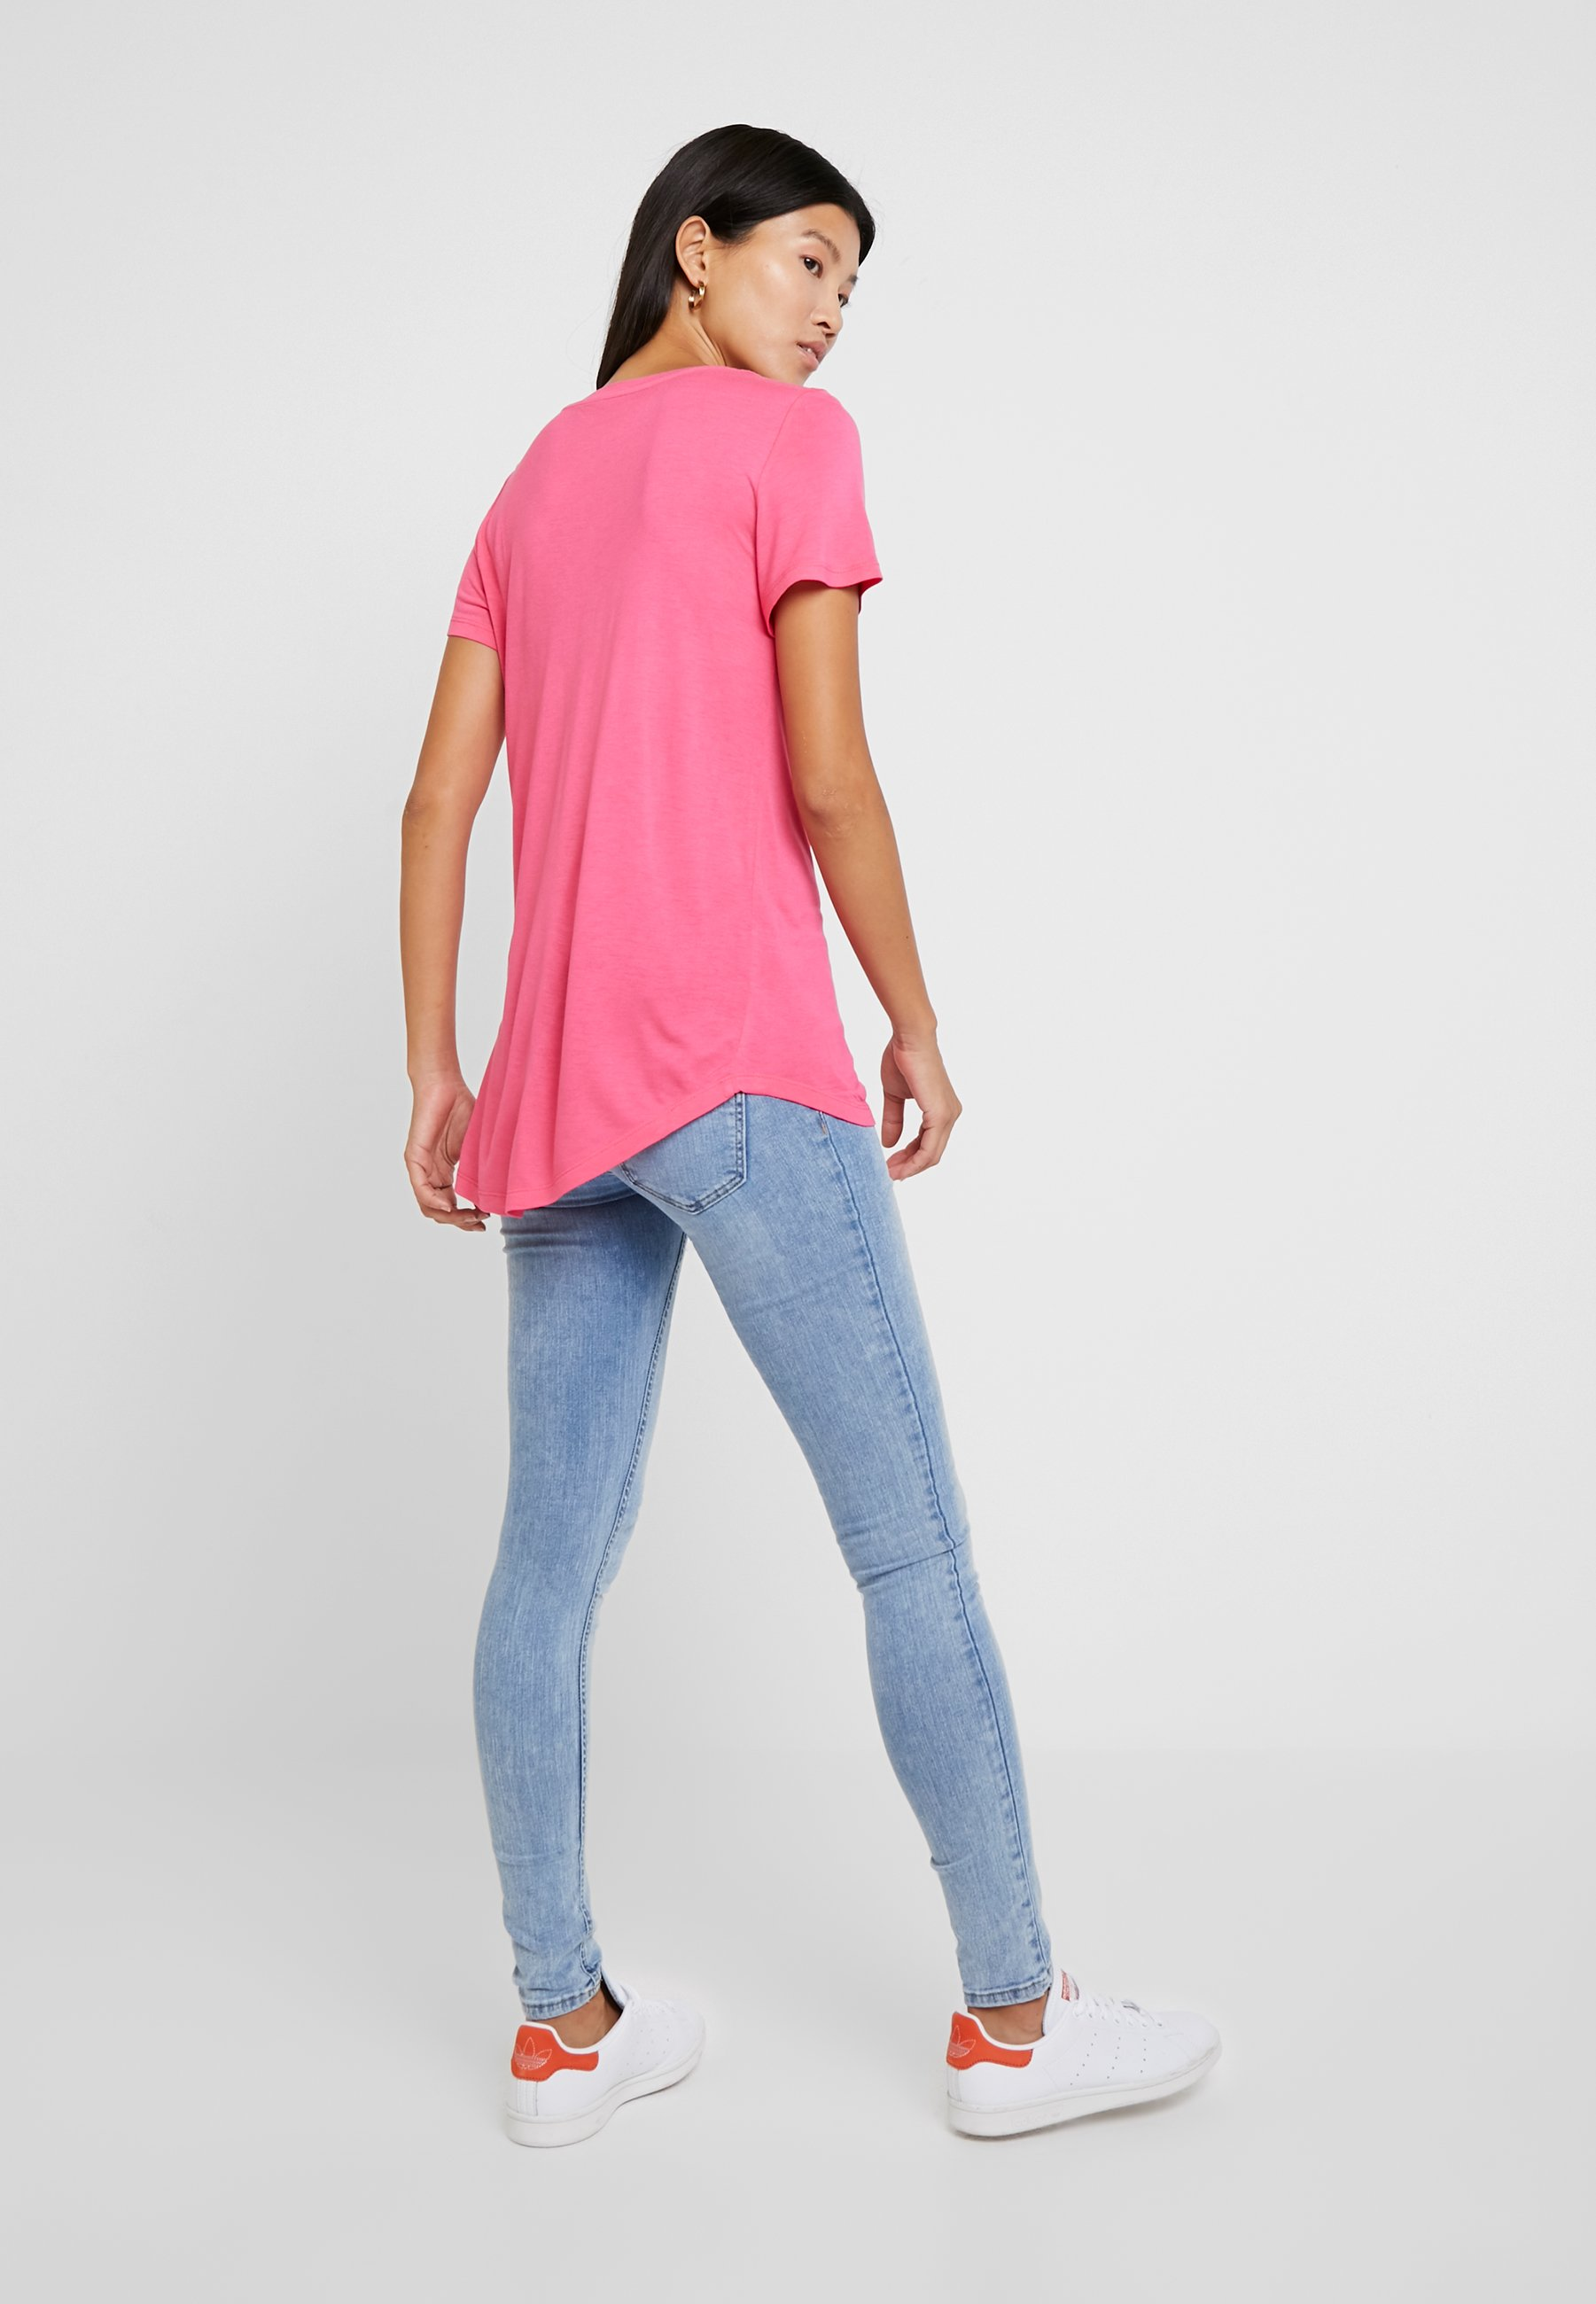 Basic Gap Pink LuxeT Wednesday shirt wPOkTiuXZ